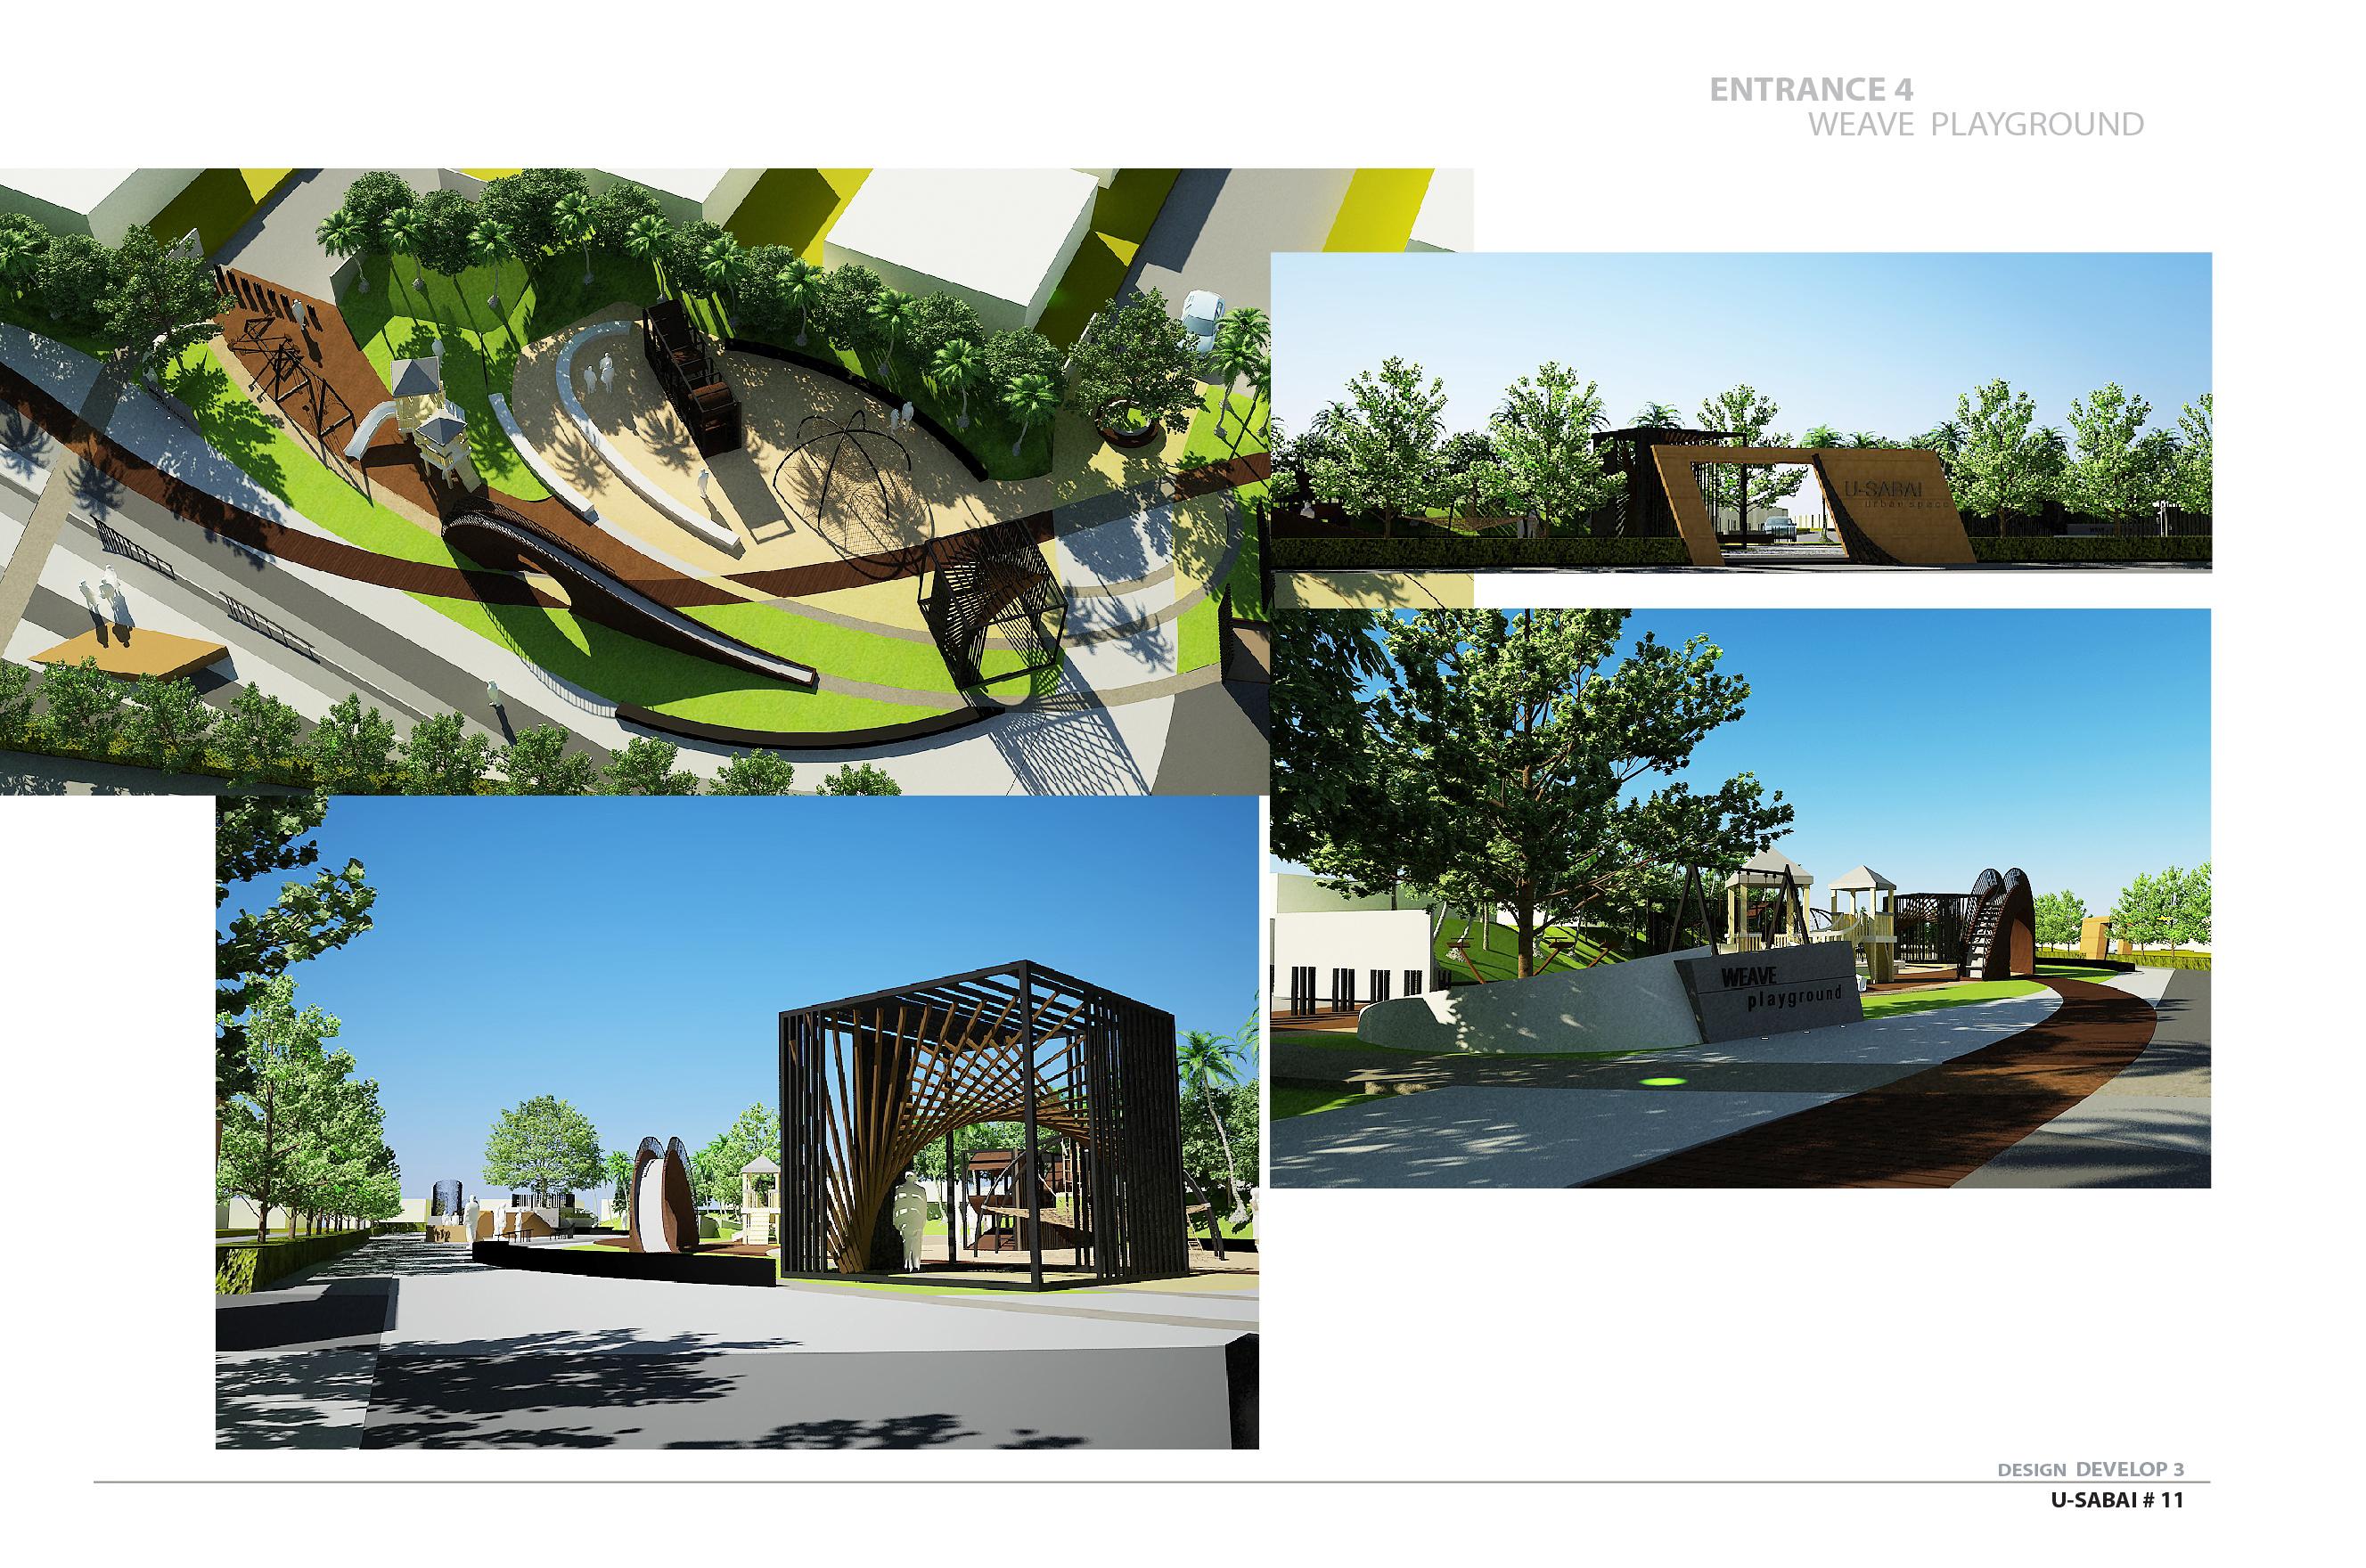 Landscape - Weave Playground